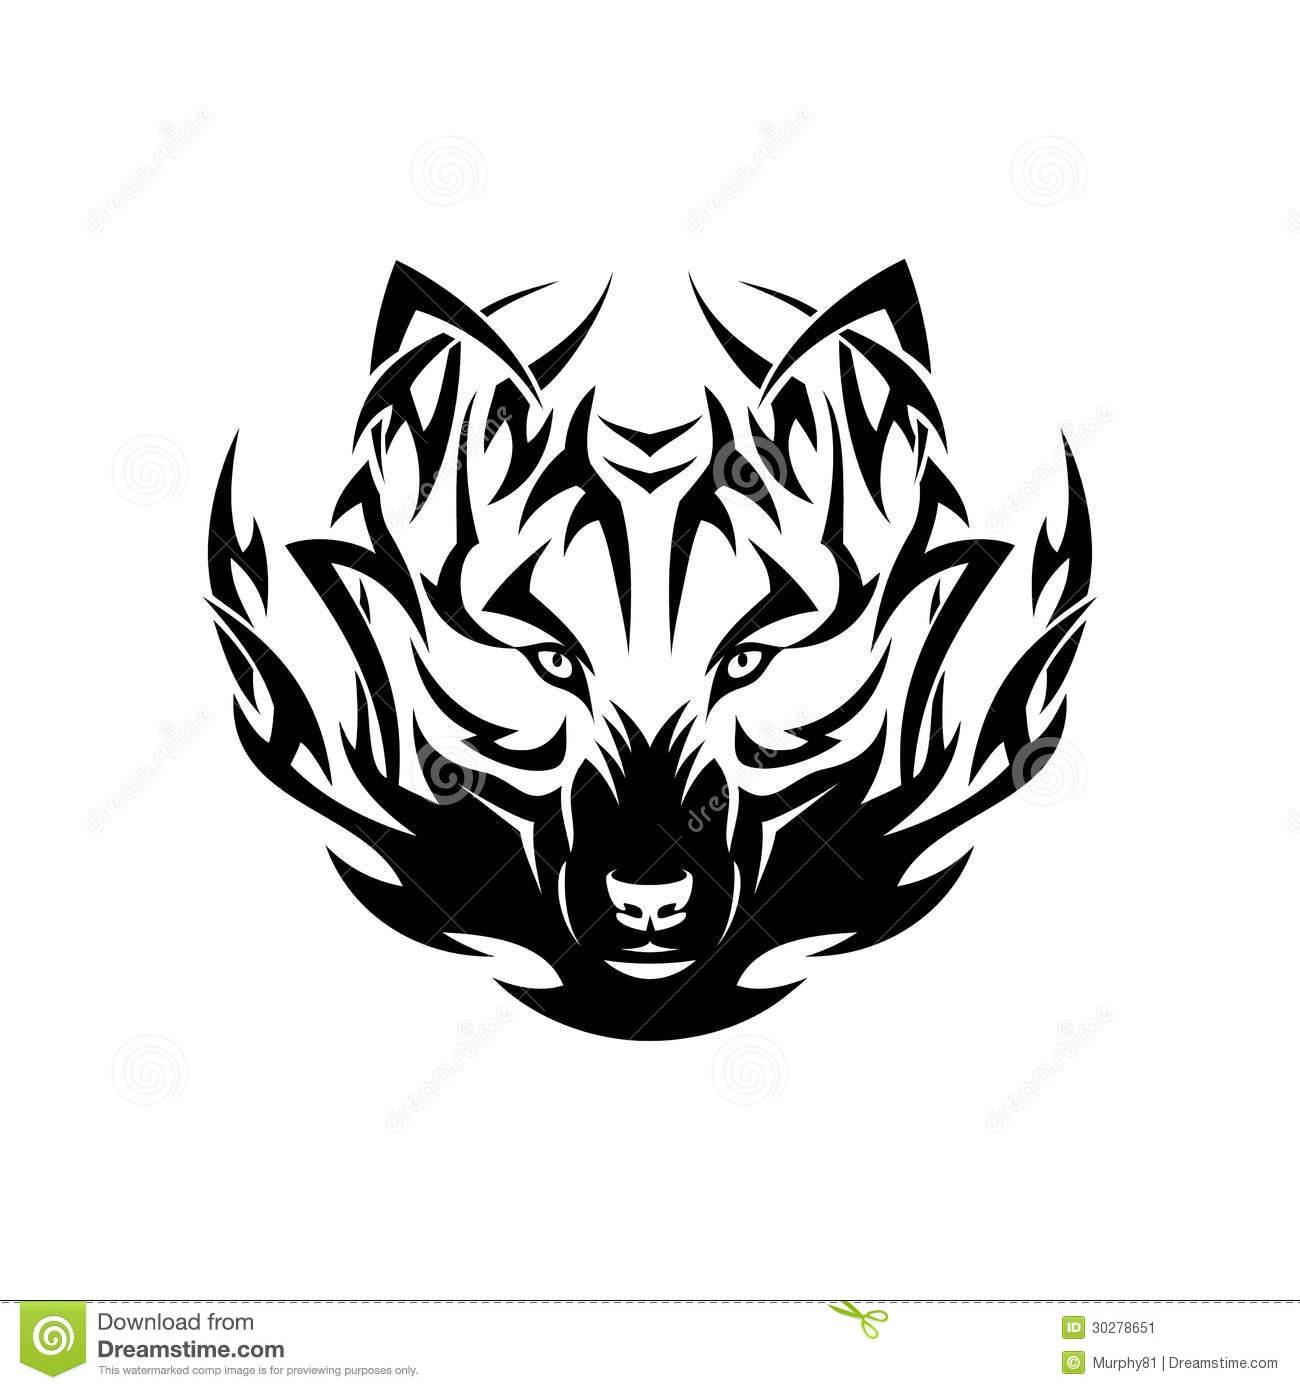 Wolfs-Head_Totem.jpg